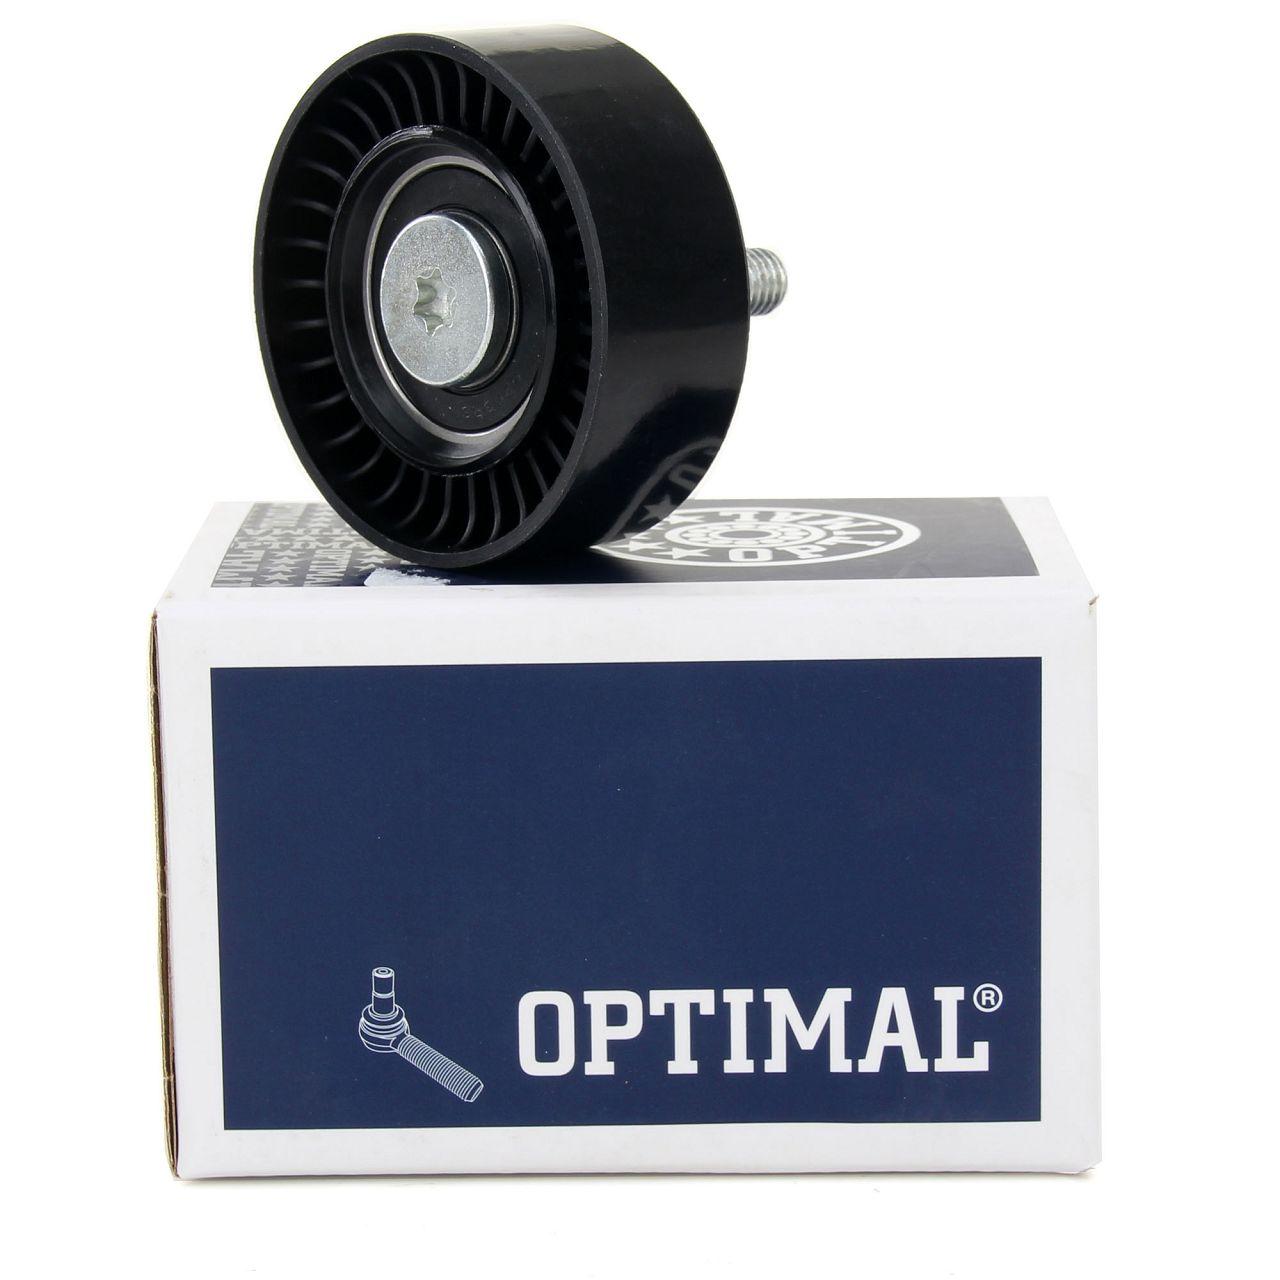 OPTIMAL Spannrolle Keilrippenriemen für BMW 3er E46 316i 318i Z3 E6 1.8 1.9